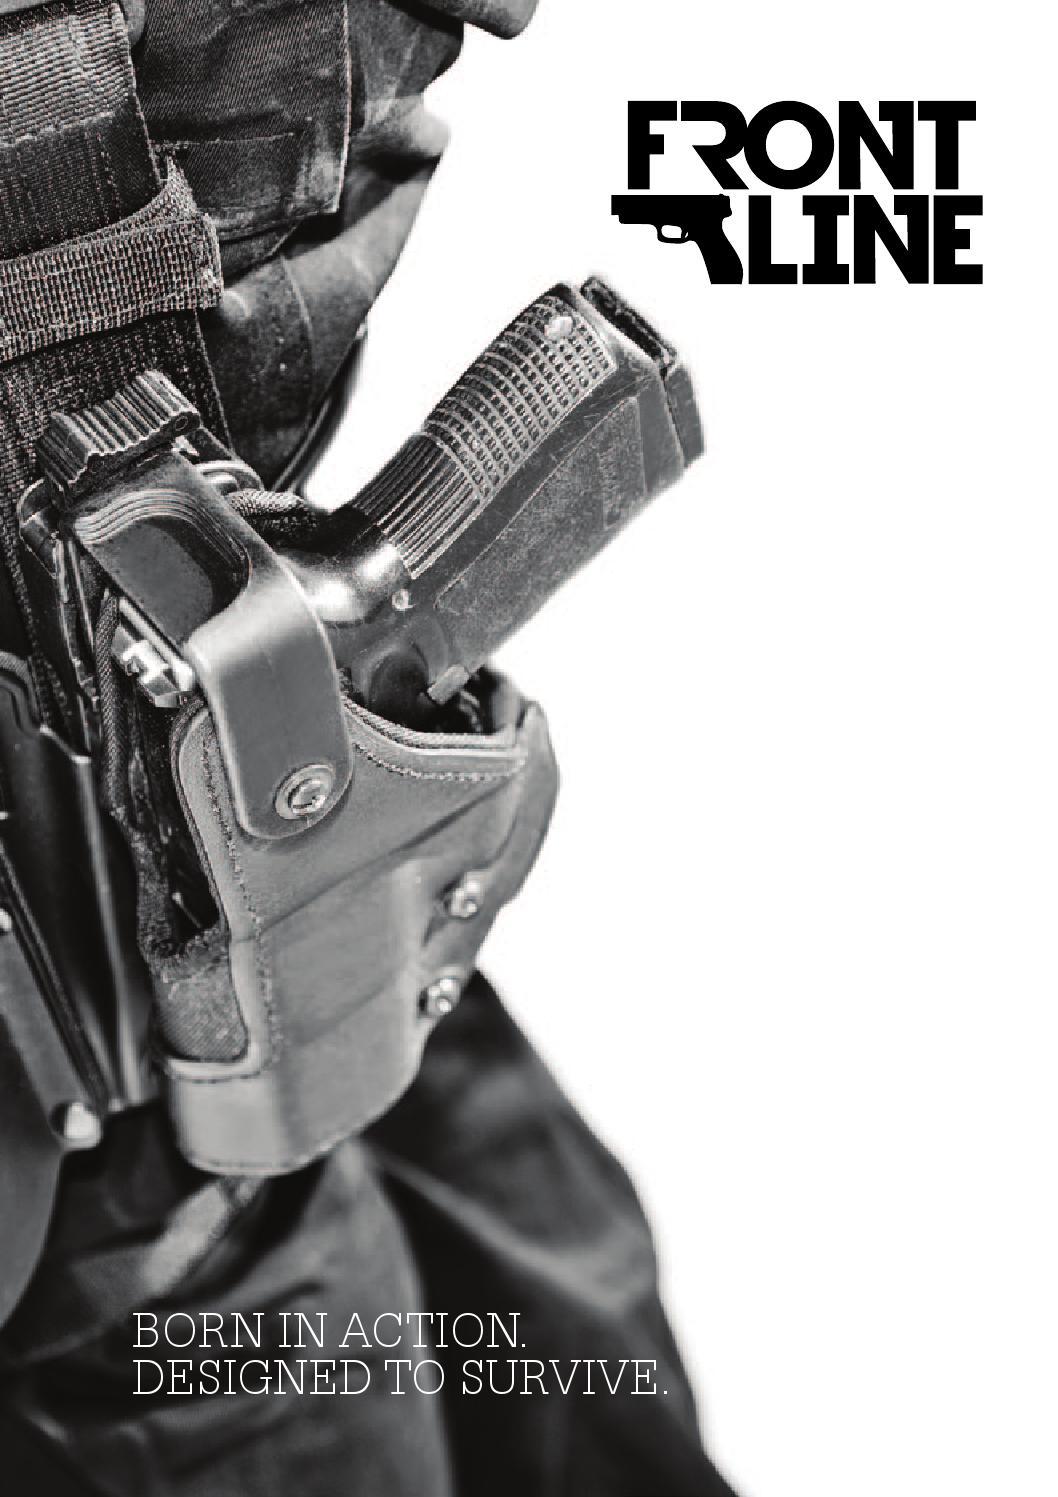 RH GLOCK 19 23 Front Line Open Top BFL Black Suede Lined 3-Layers Belt Holster